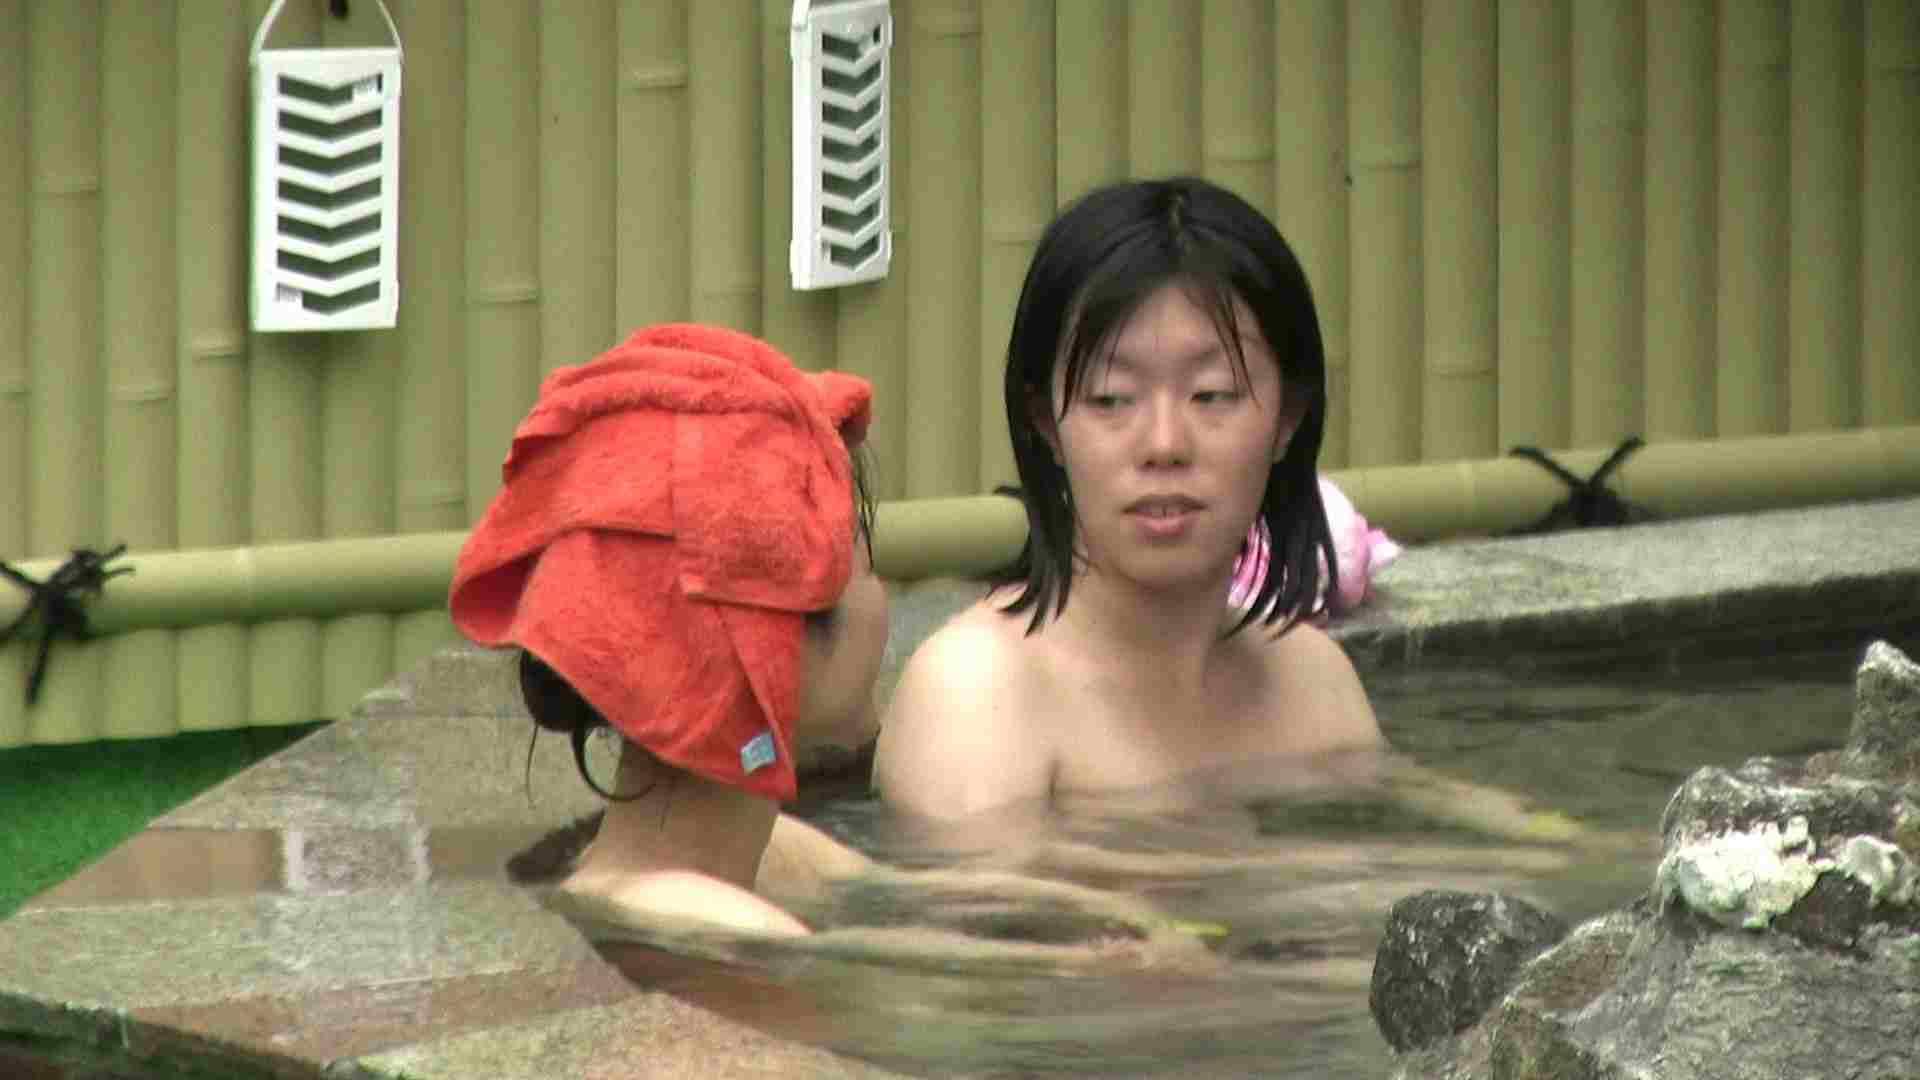 Aquaな露天風呂Vol.187 盗撮映像  99Pix 10